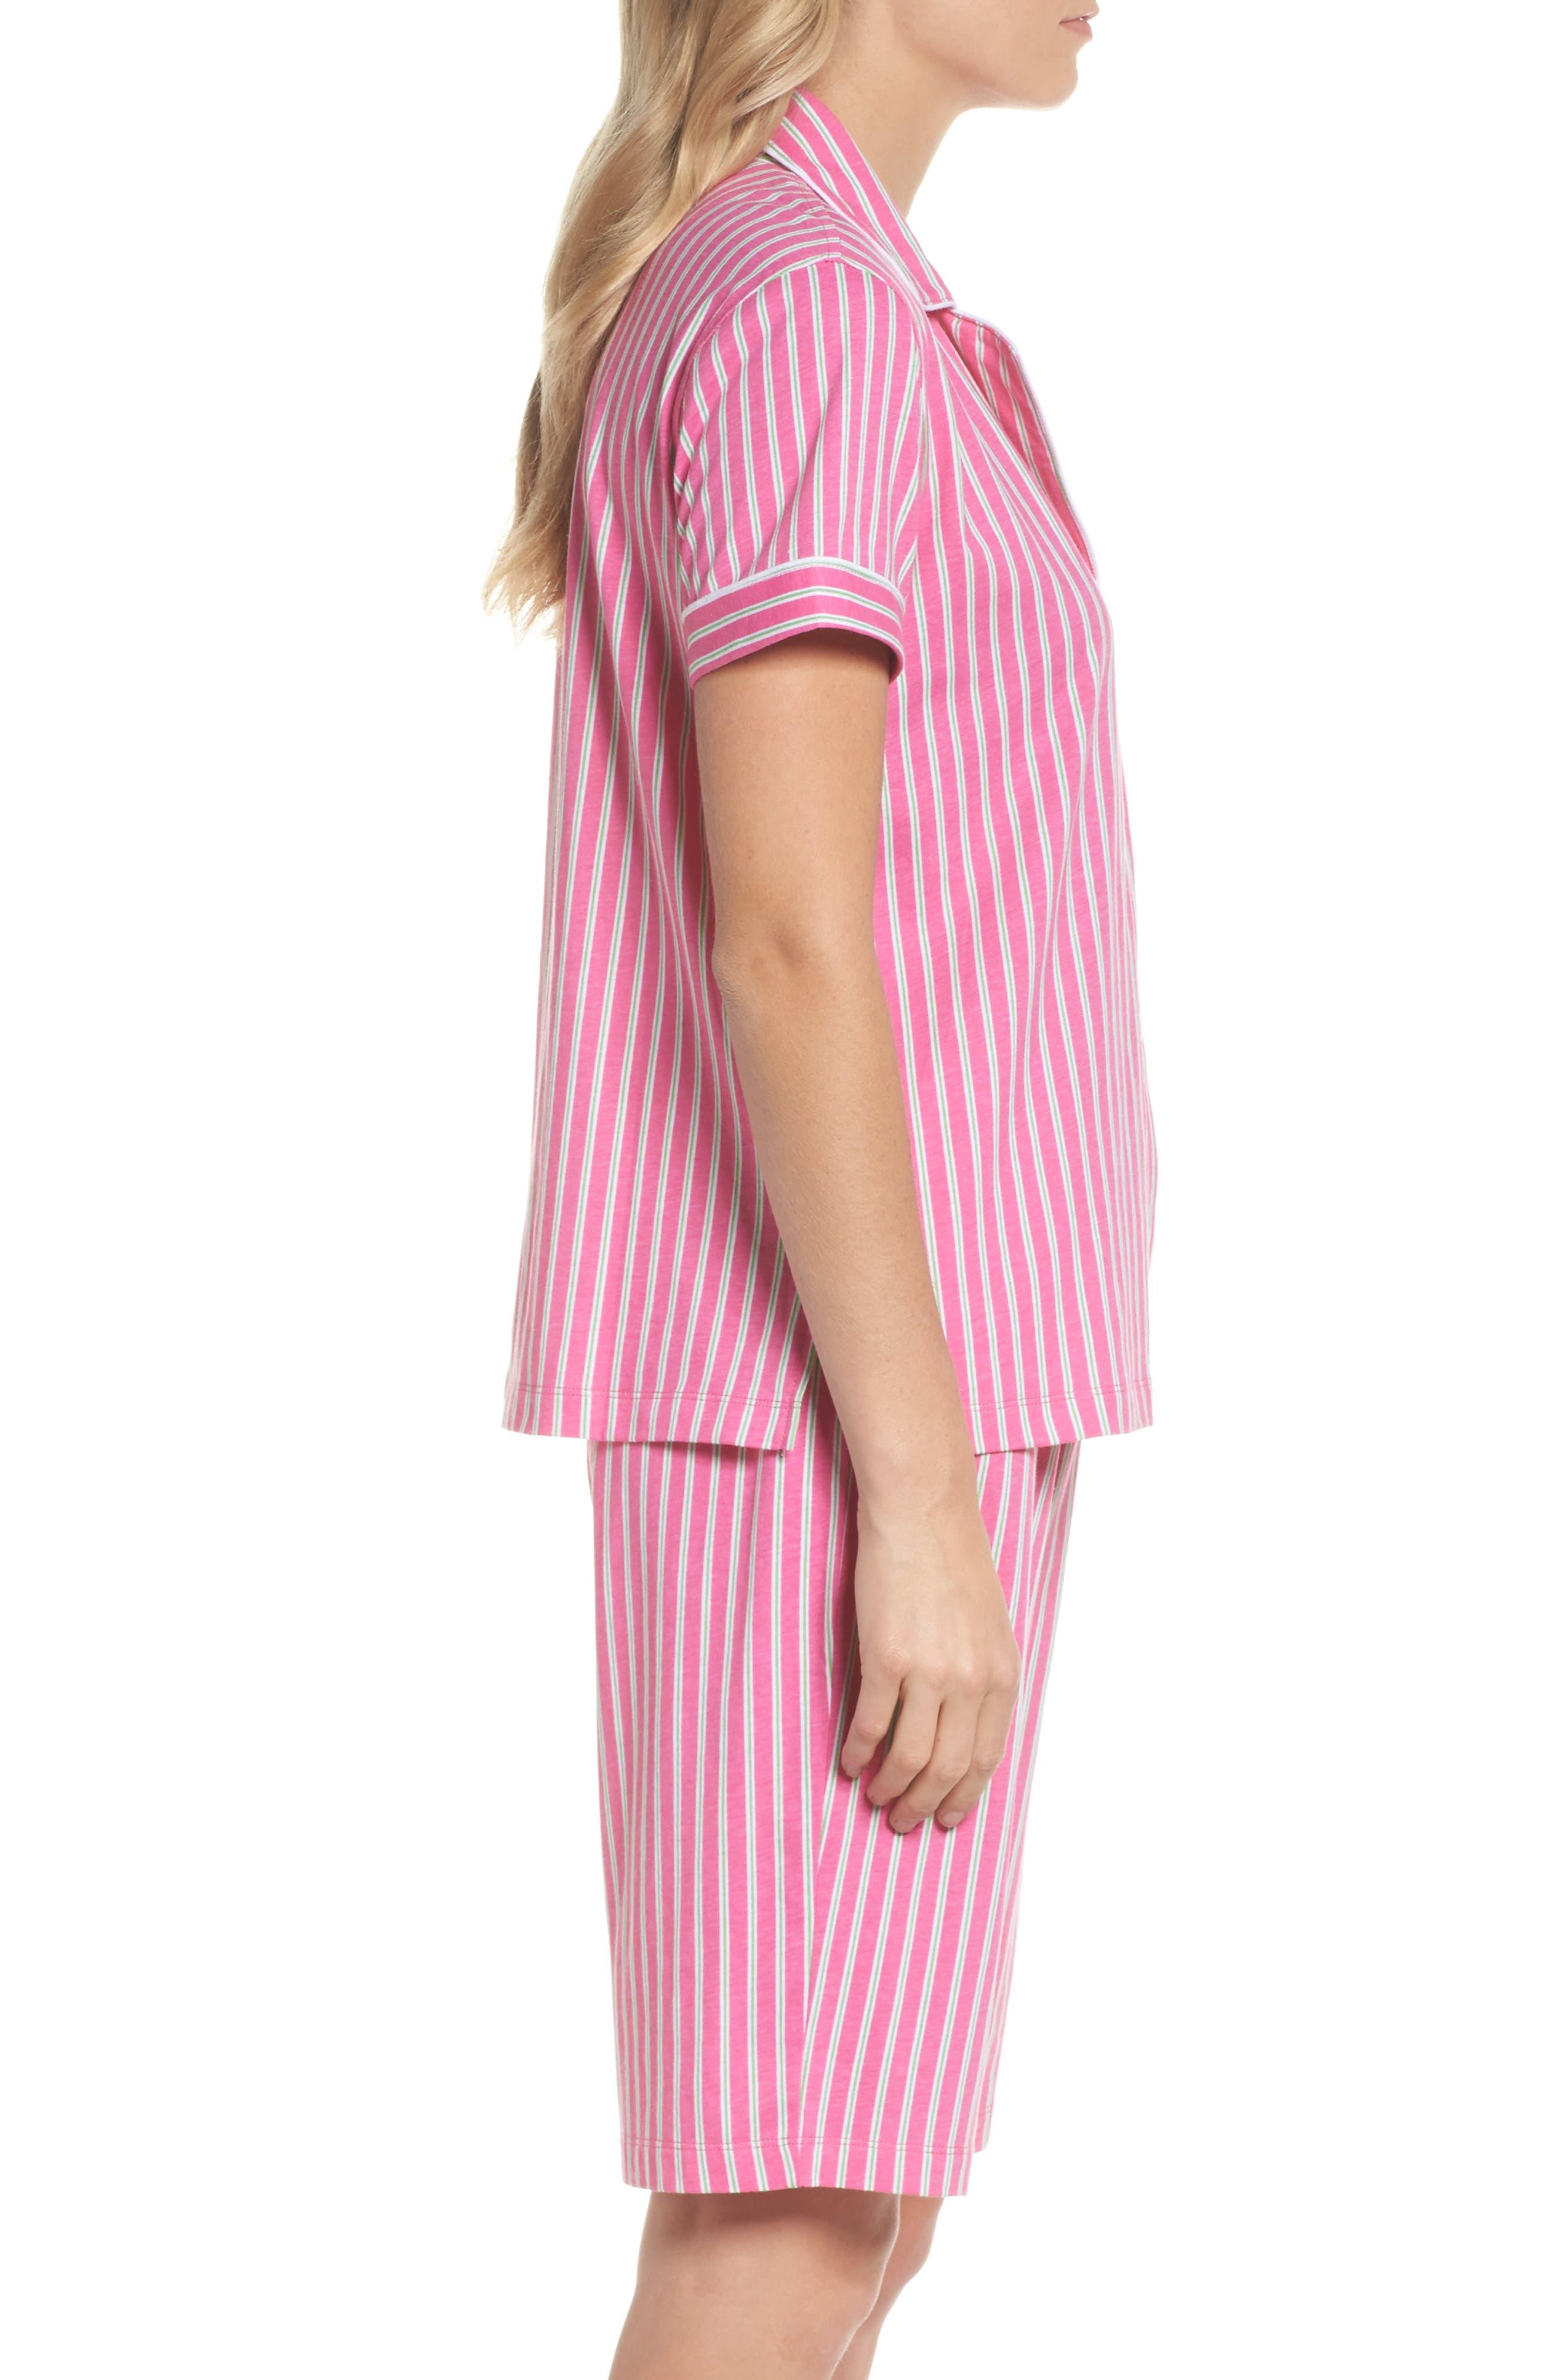 Bermuda Pajamas,                             Alternate thumbnail 3, color,                             Pink Stripe